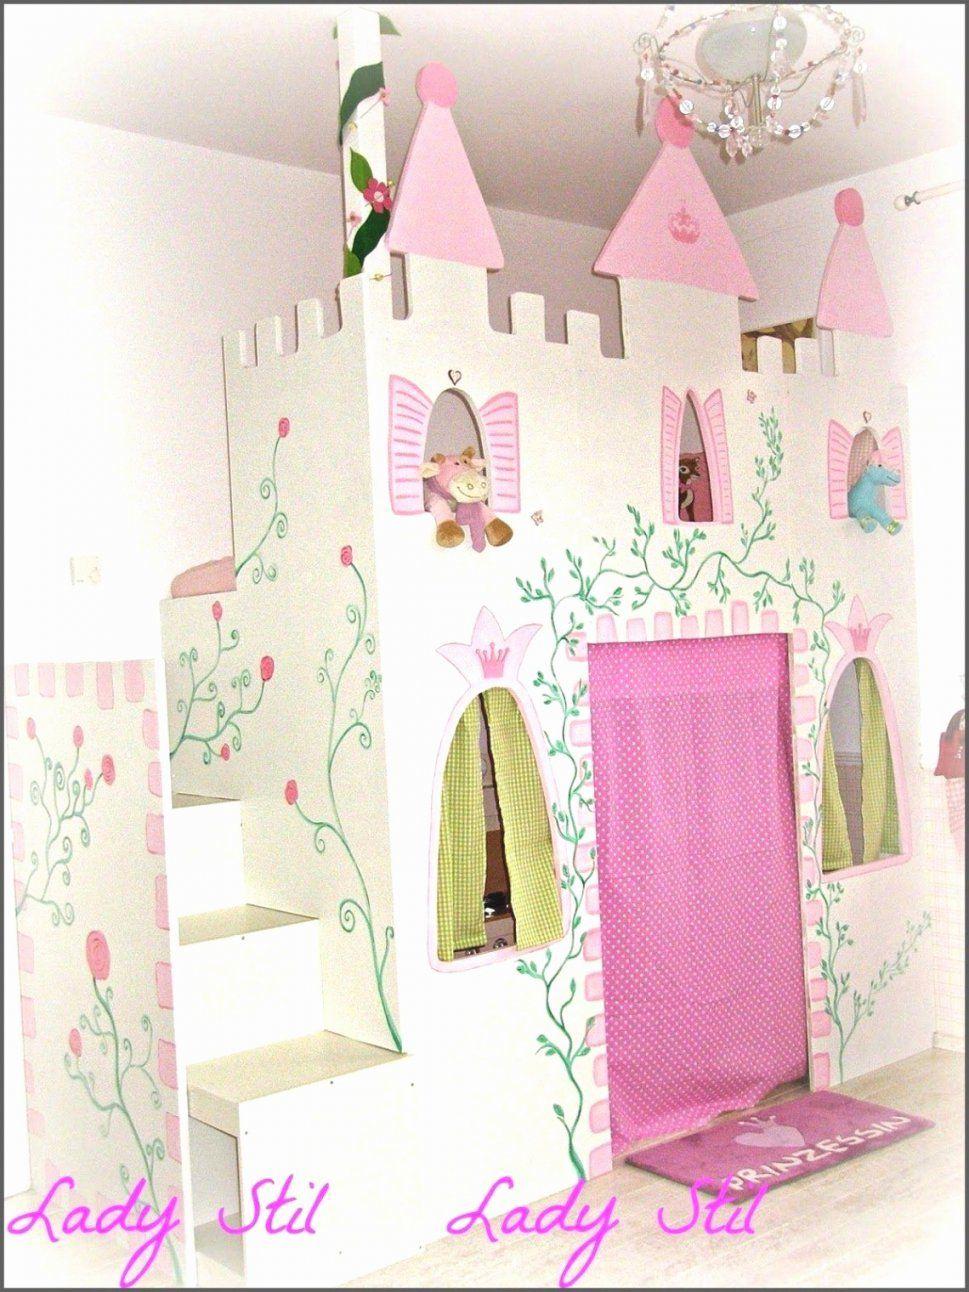 Kinderbett Selber Bauen Prinzessin Inspirierend Schön Erstaunlich von Kinderbett Selber Bauen Prinzessin Photo